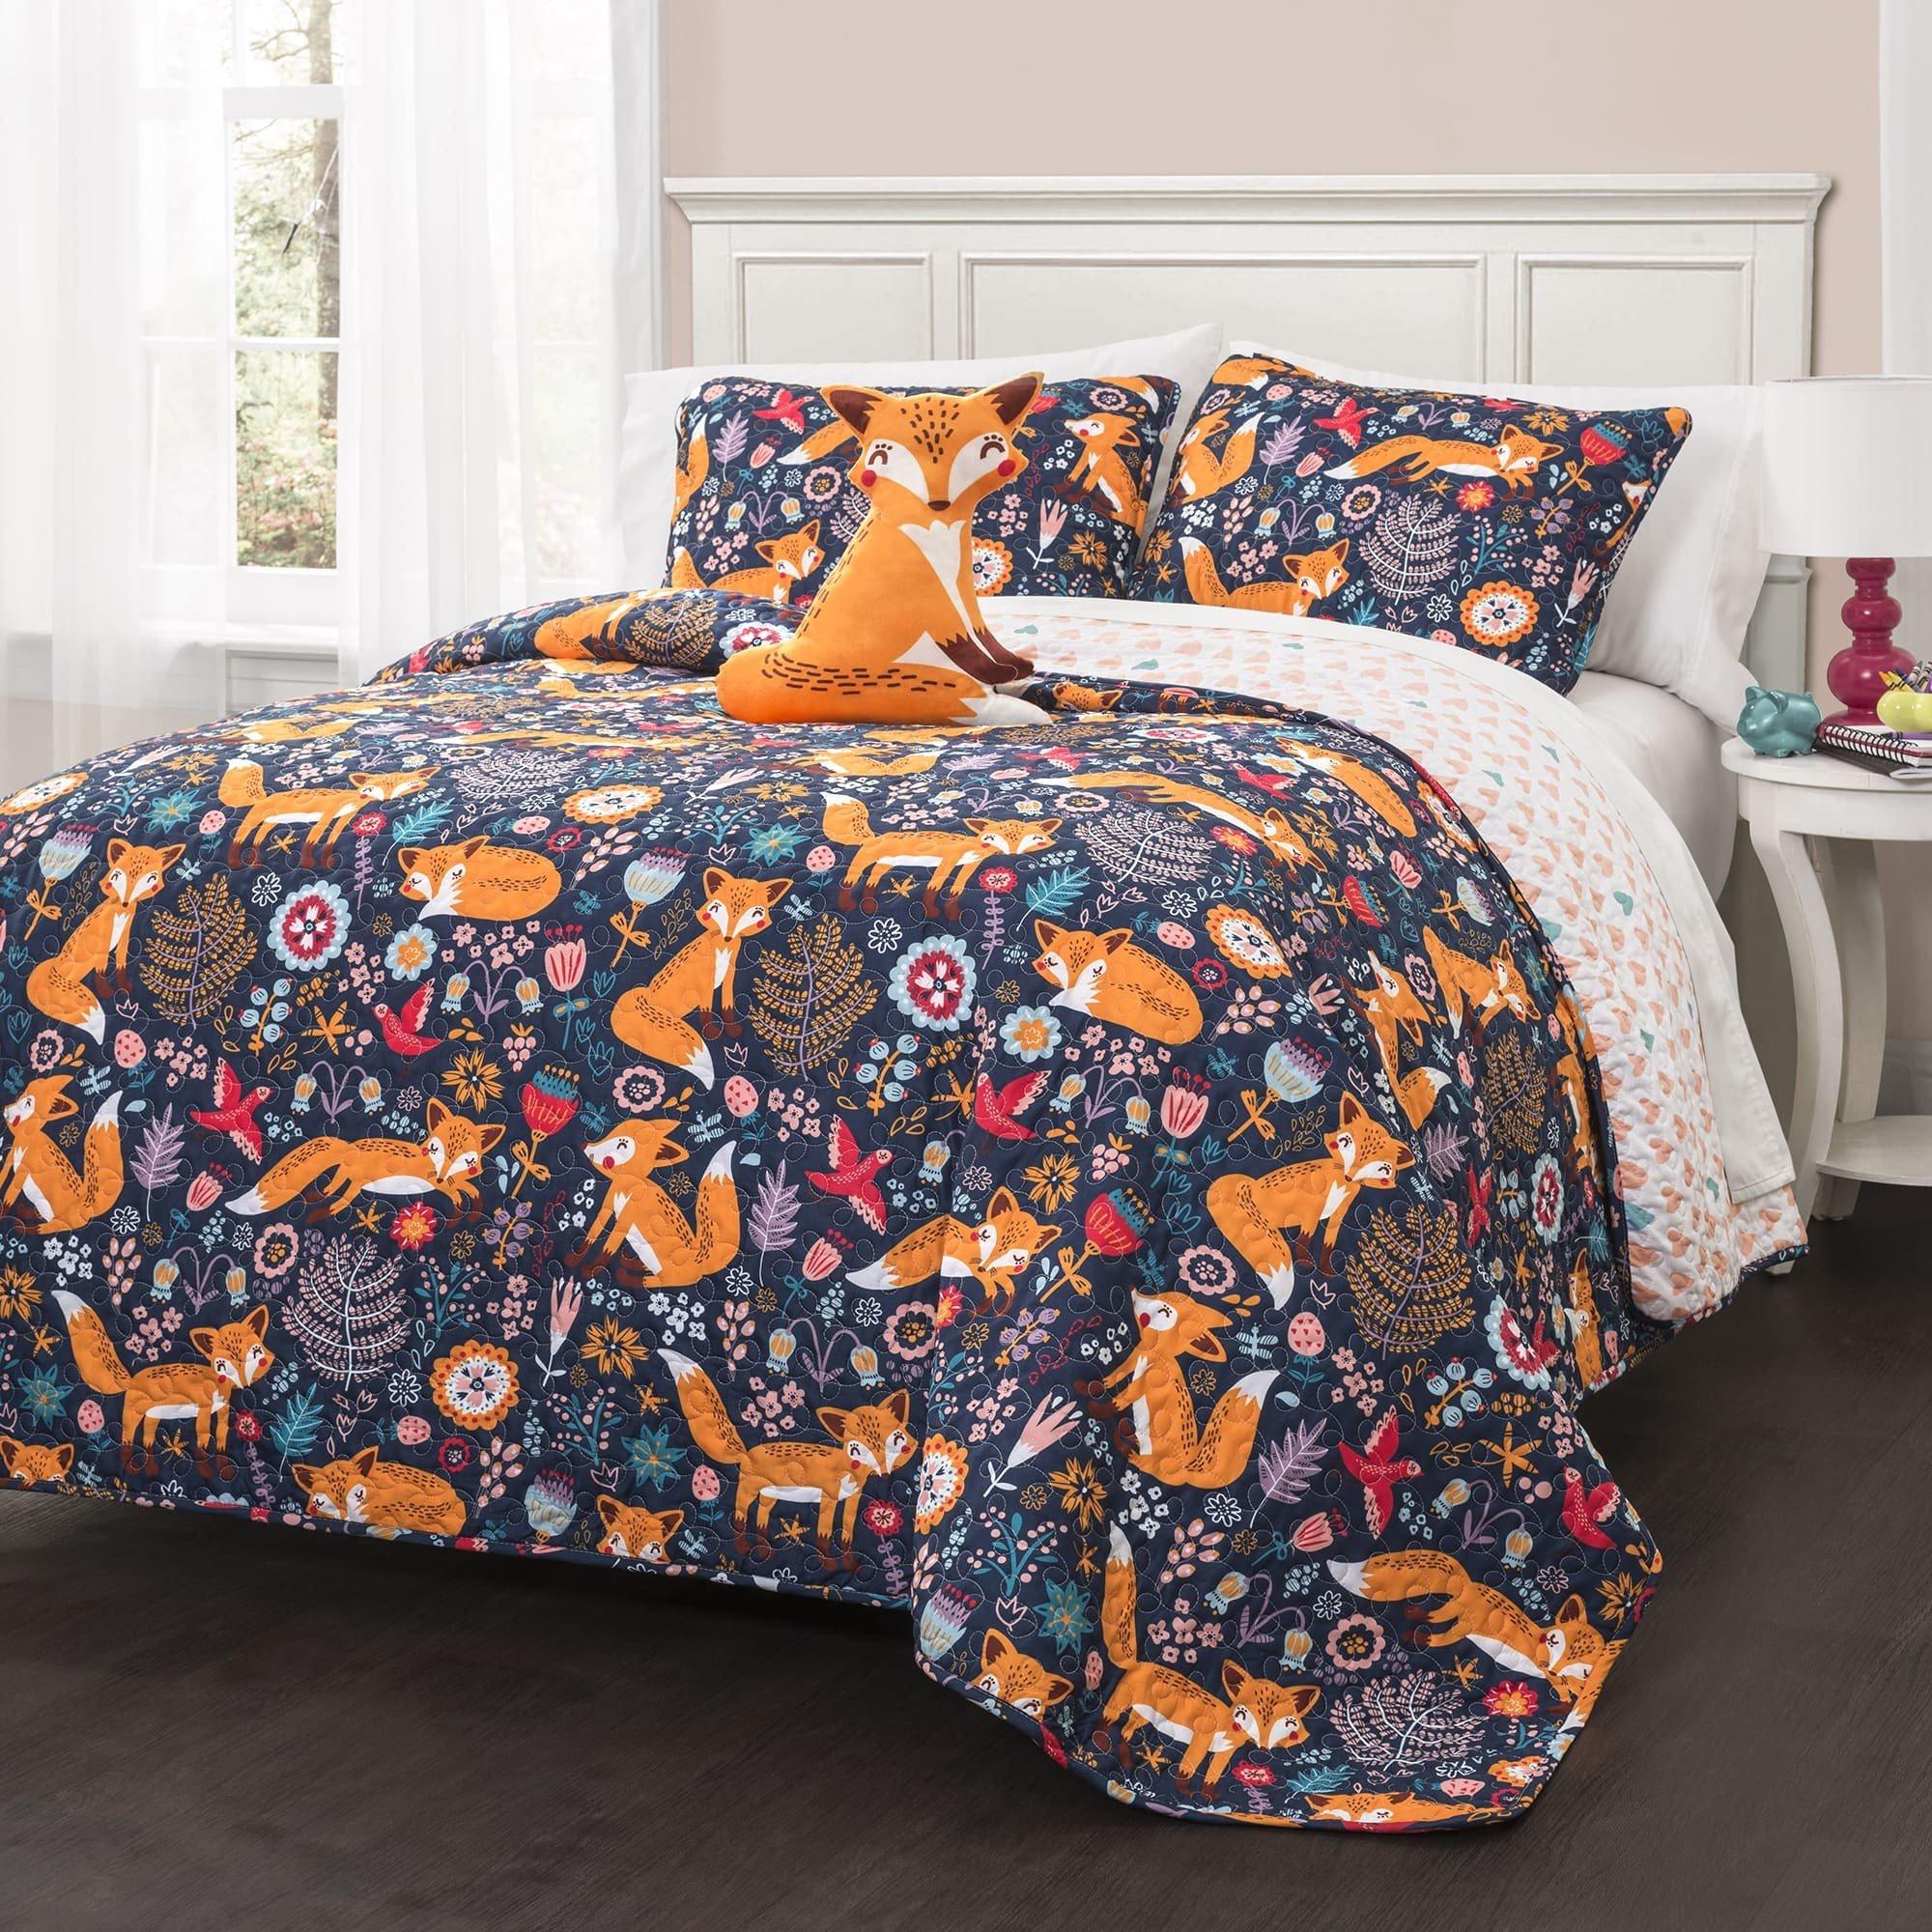 4 Piece Navy Blue Kids Animal Print Full Queen Quilt Set, Orange Grey Pink Frolicking Cute Fox Theme Bedding, Lightweight Floral Geometric Medallion Flowers Birds Reversible Heart,Polyester